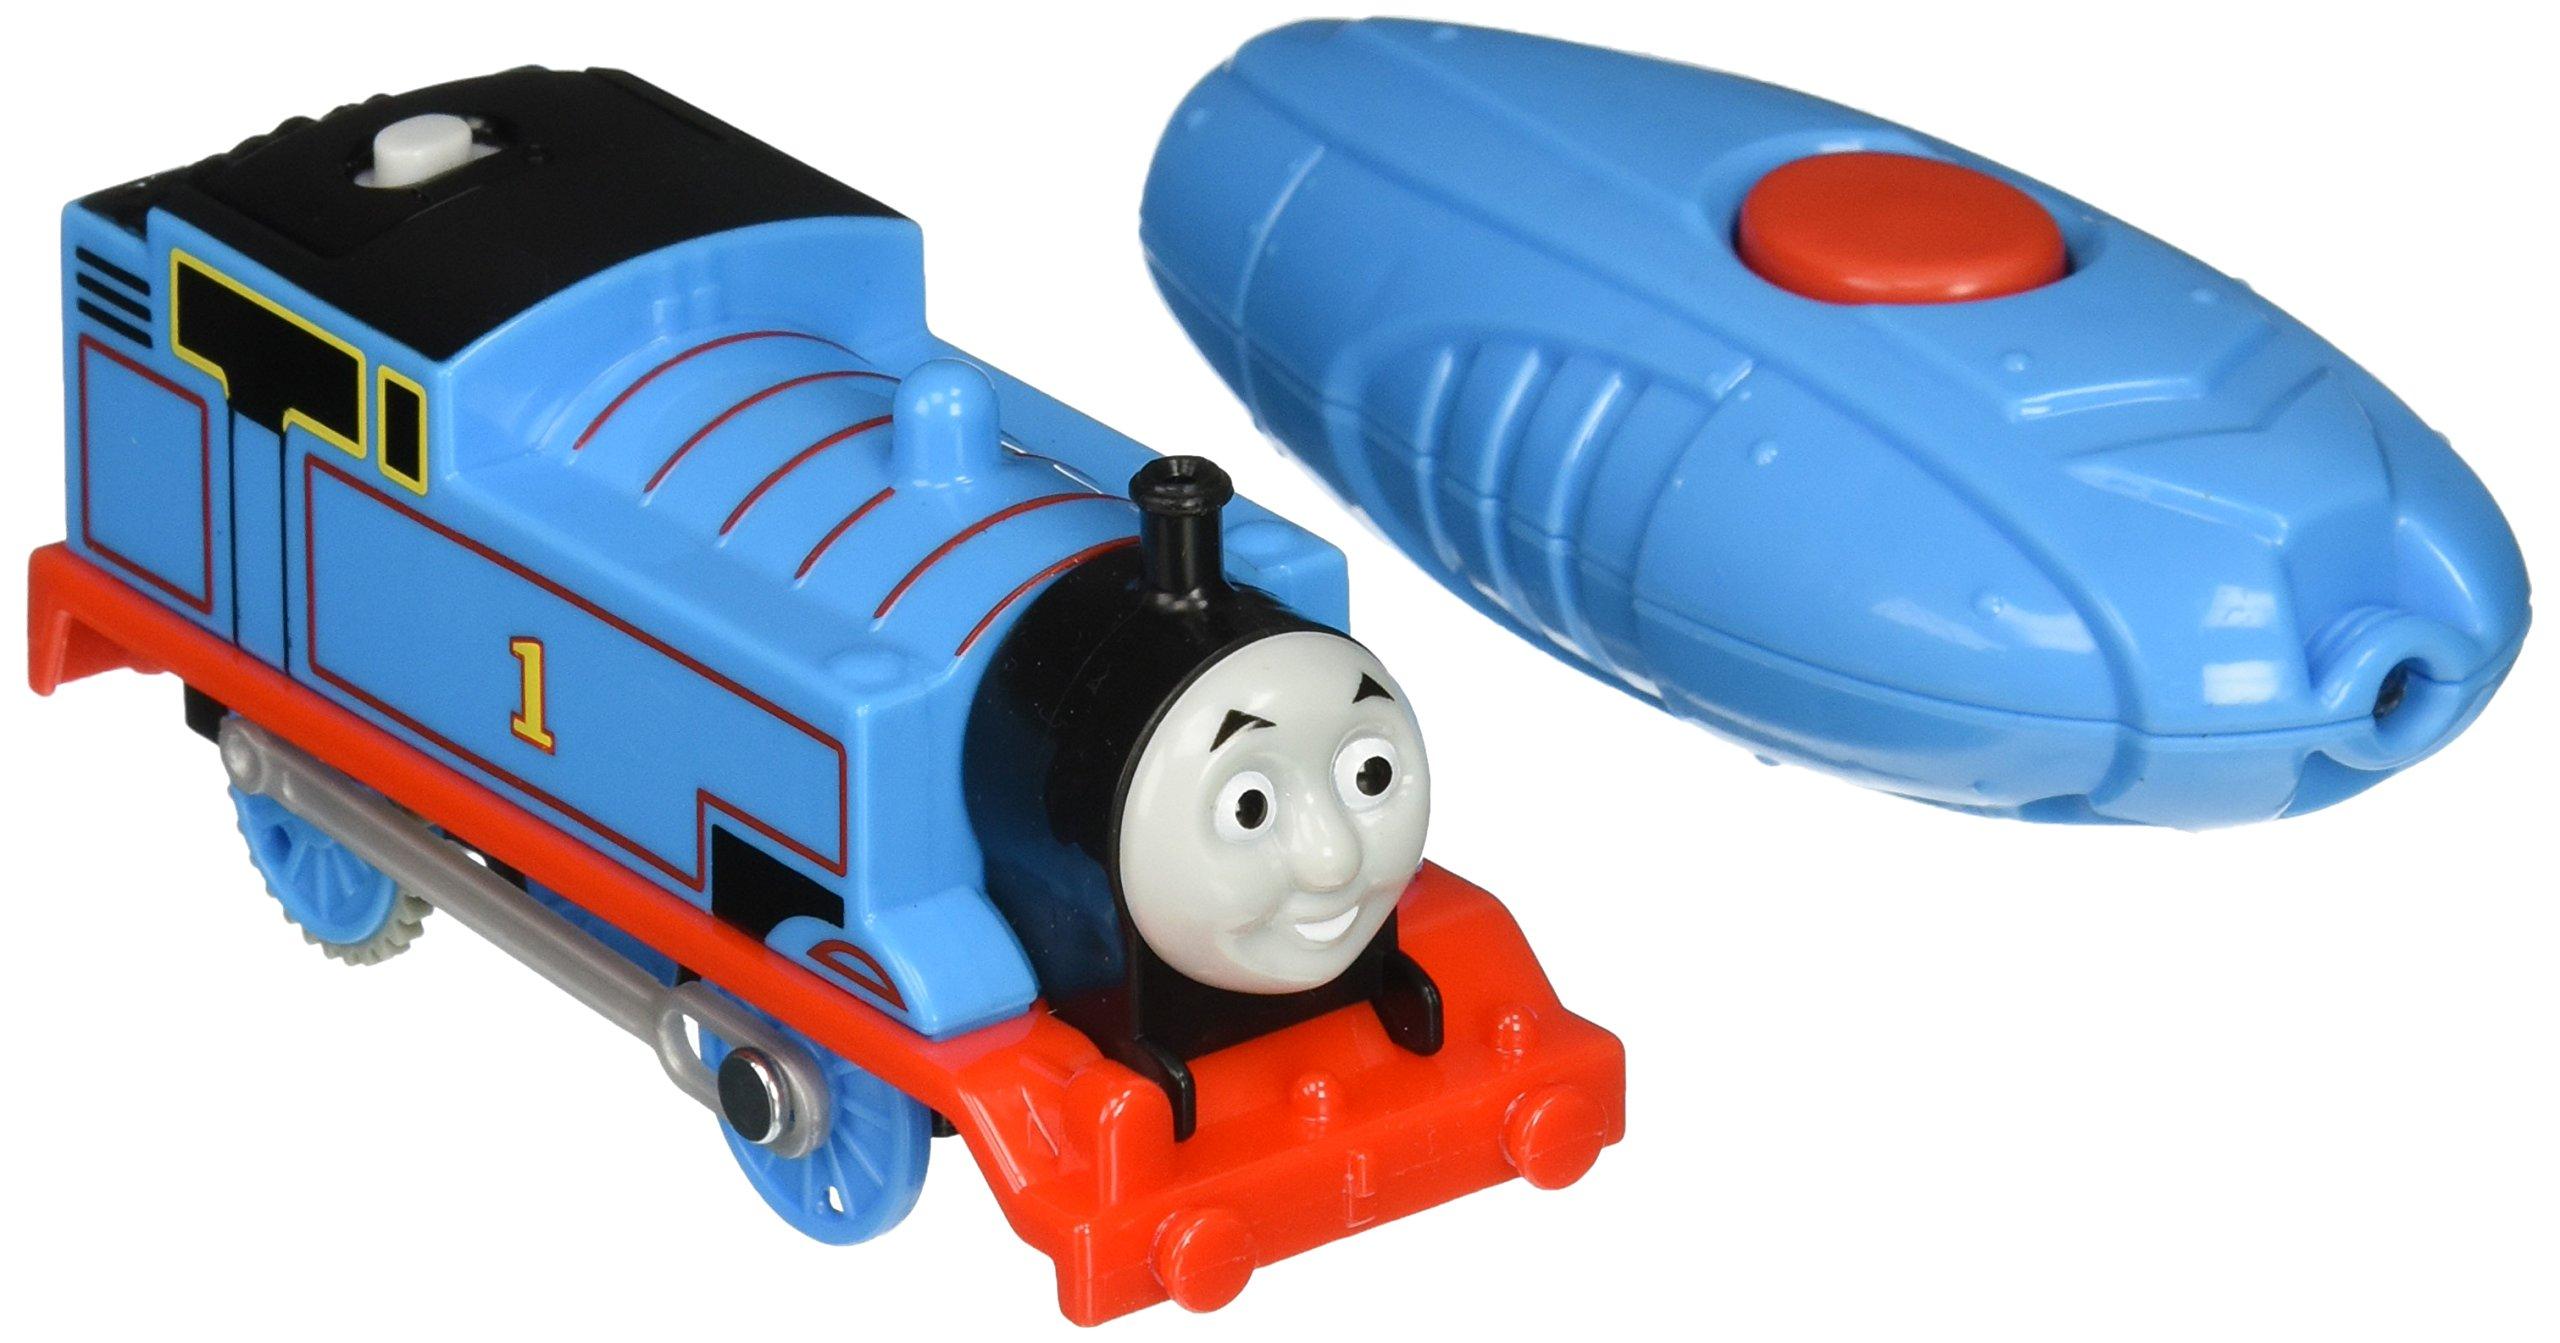 Thomas & Friends Fisher-Price TrackMaster, R/C Thomas